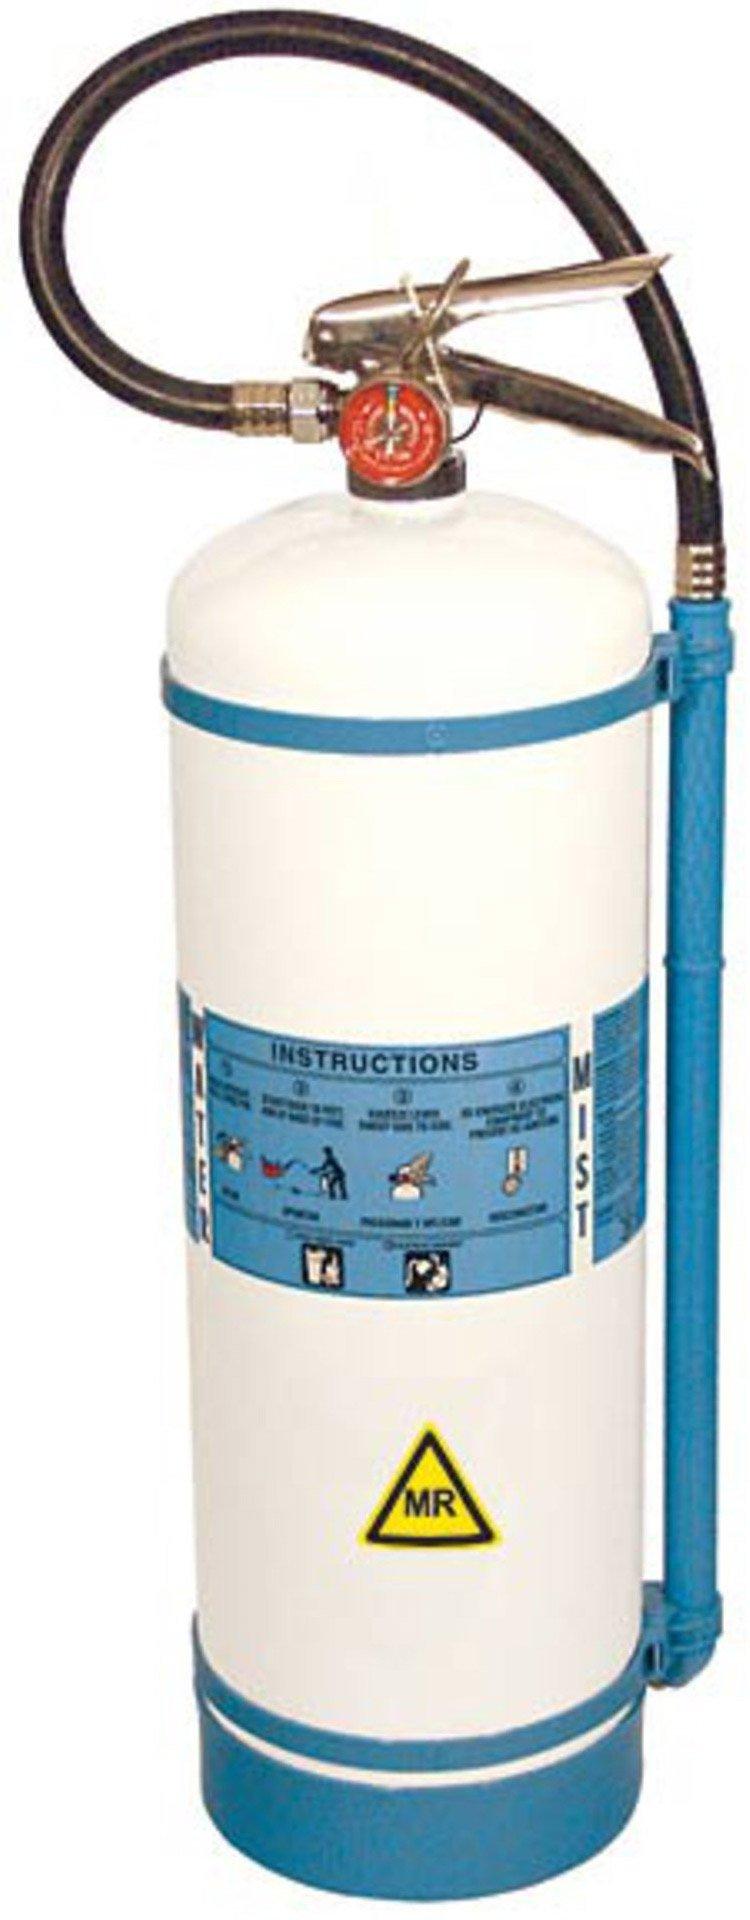 MRI-Certified Fire Extinguisher 2 1/2 Gallon